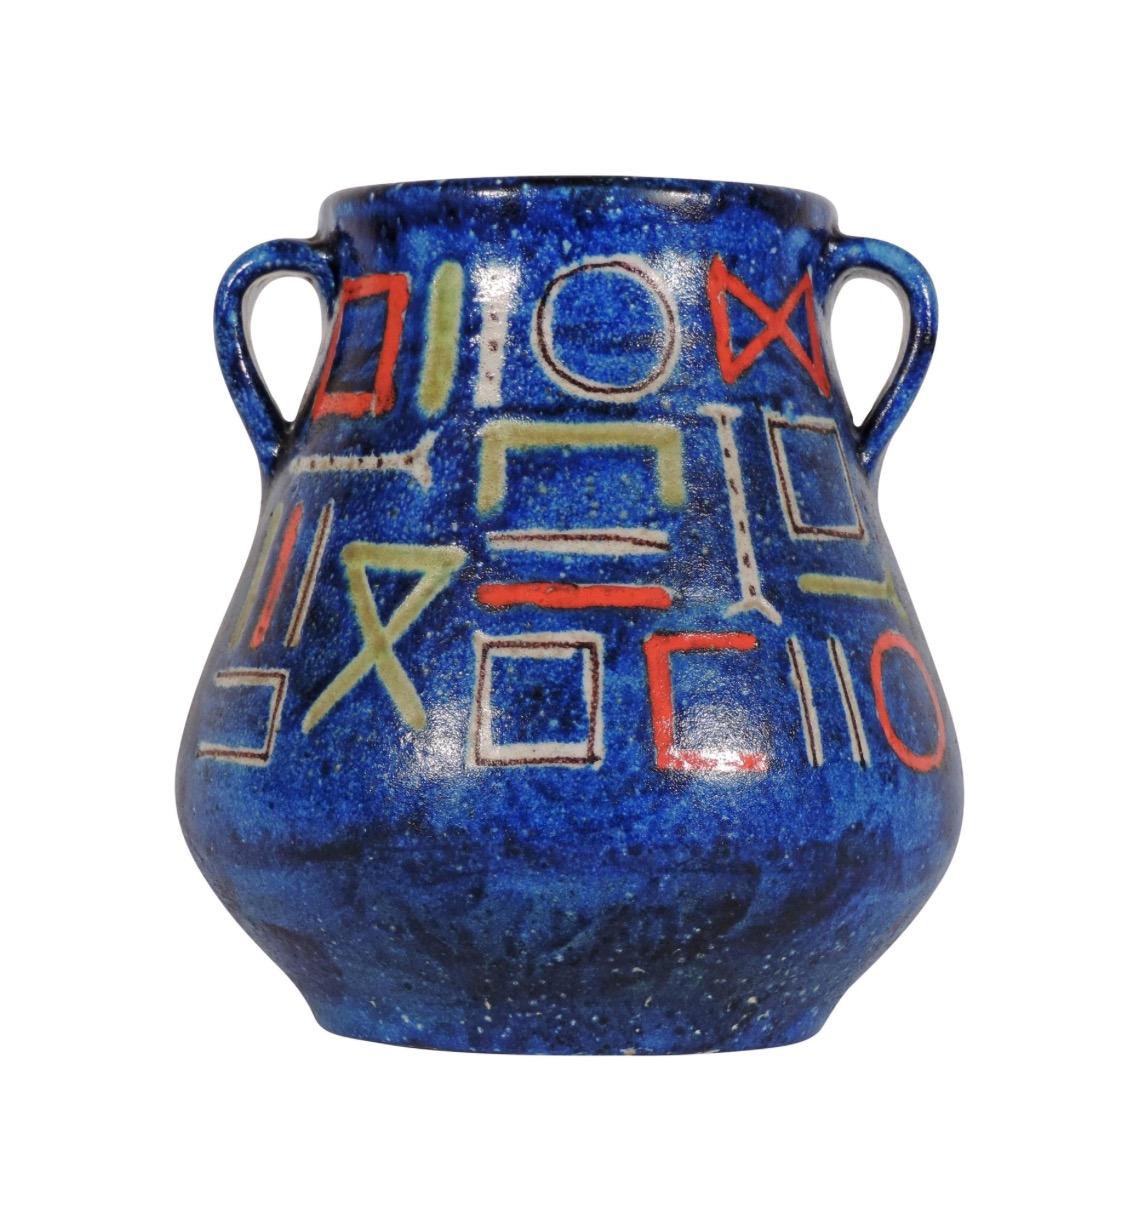 Guido Gambone ceramic vase